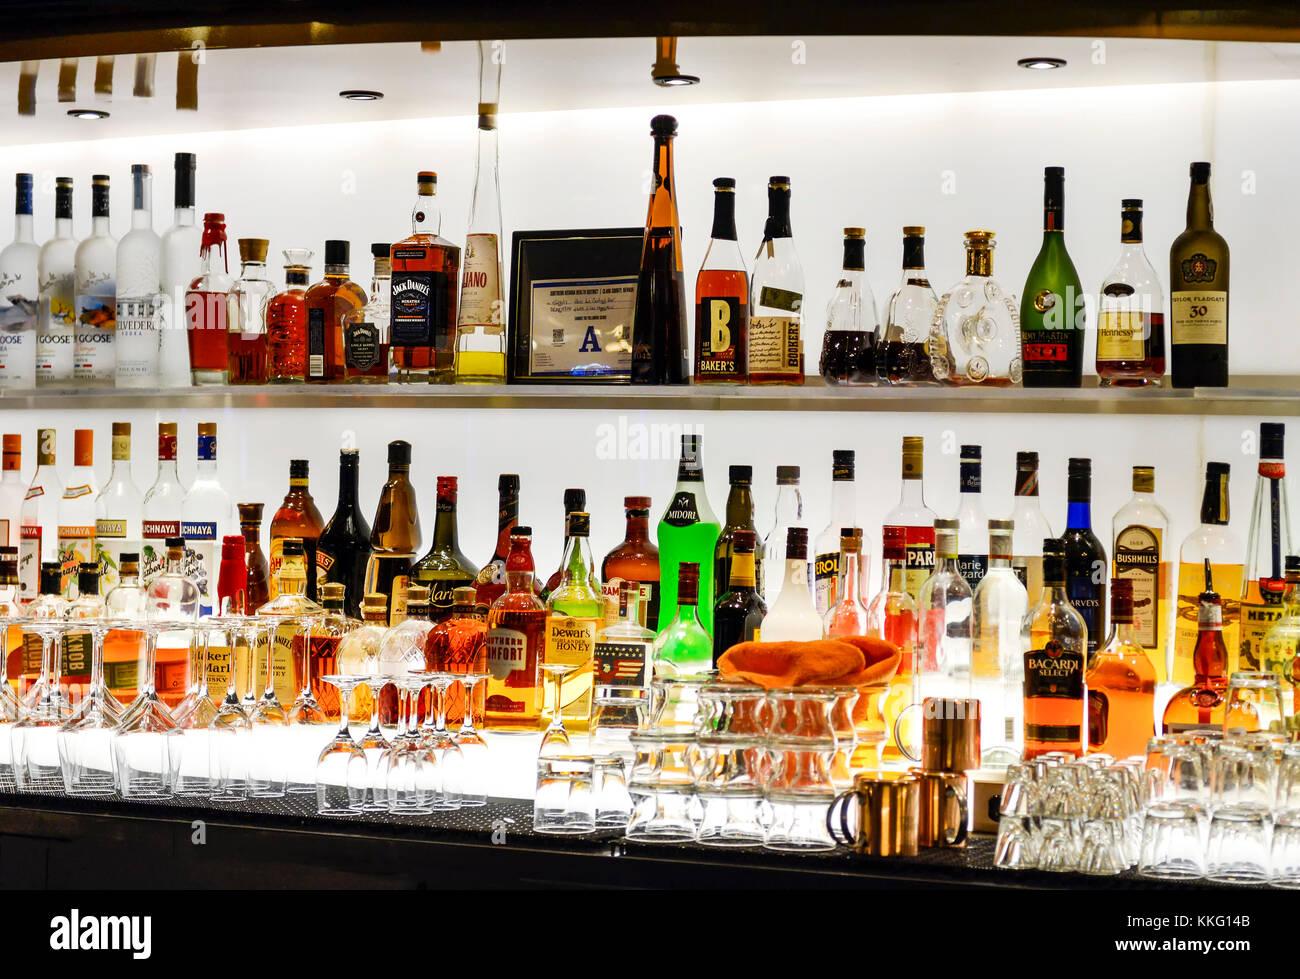 Stocked bar stock photos stocked bar stock images alamy - Bar le central ...